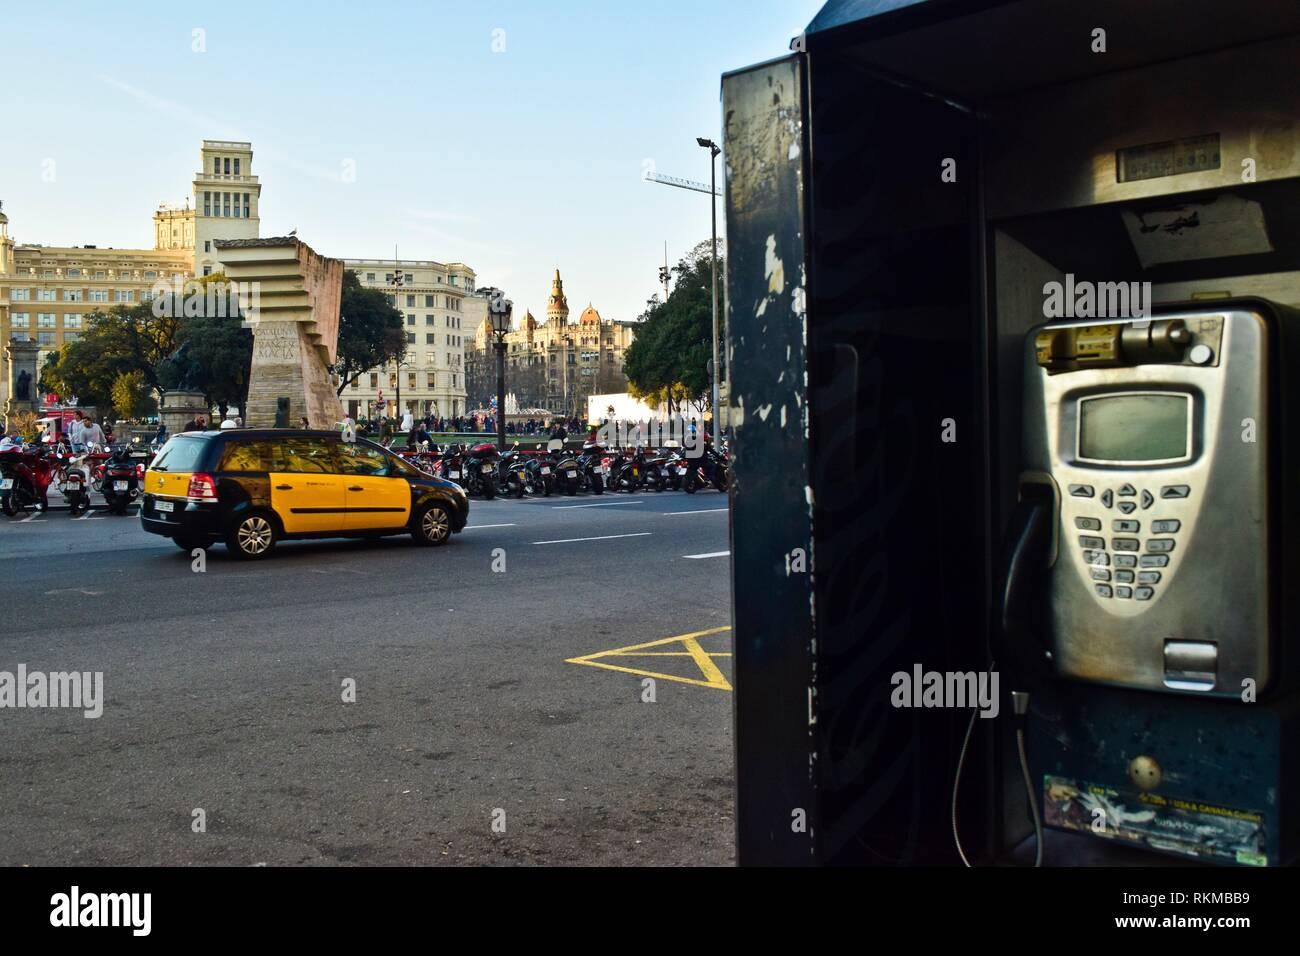 Payphone. Plaça de Catalunya. Barcelona, Catalonia, Spain. - Stock Image